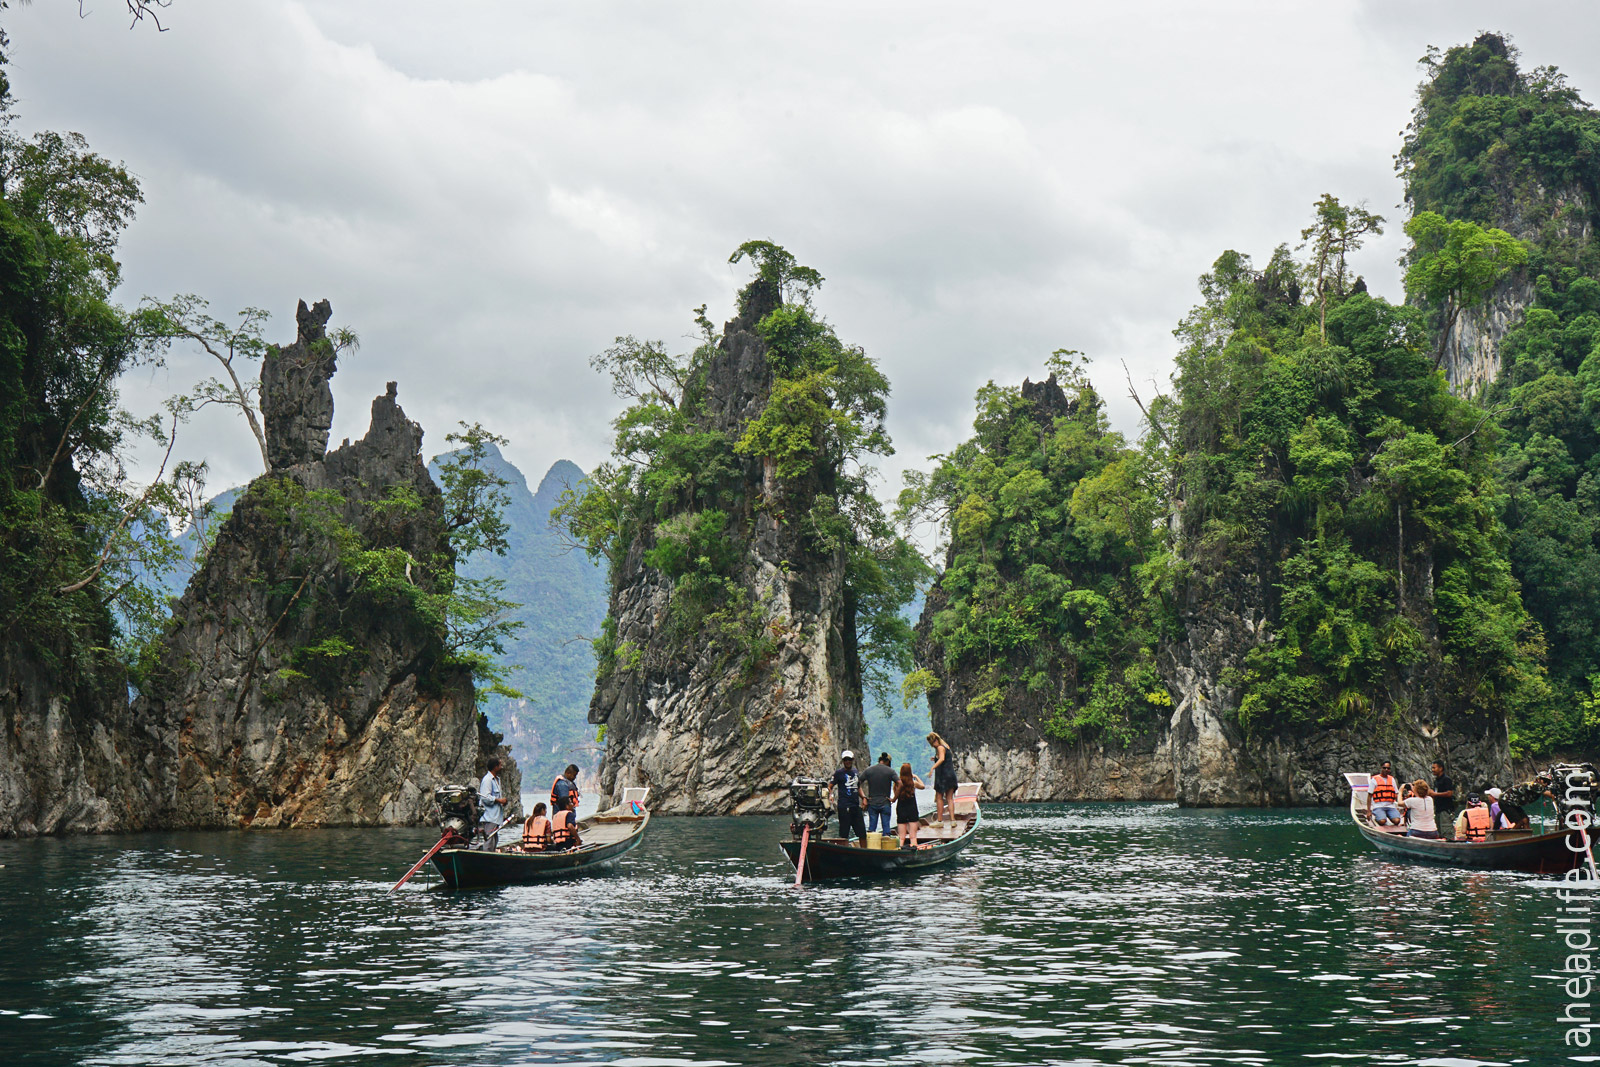 Лодки у трех скал - символов Као Сок